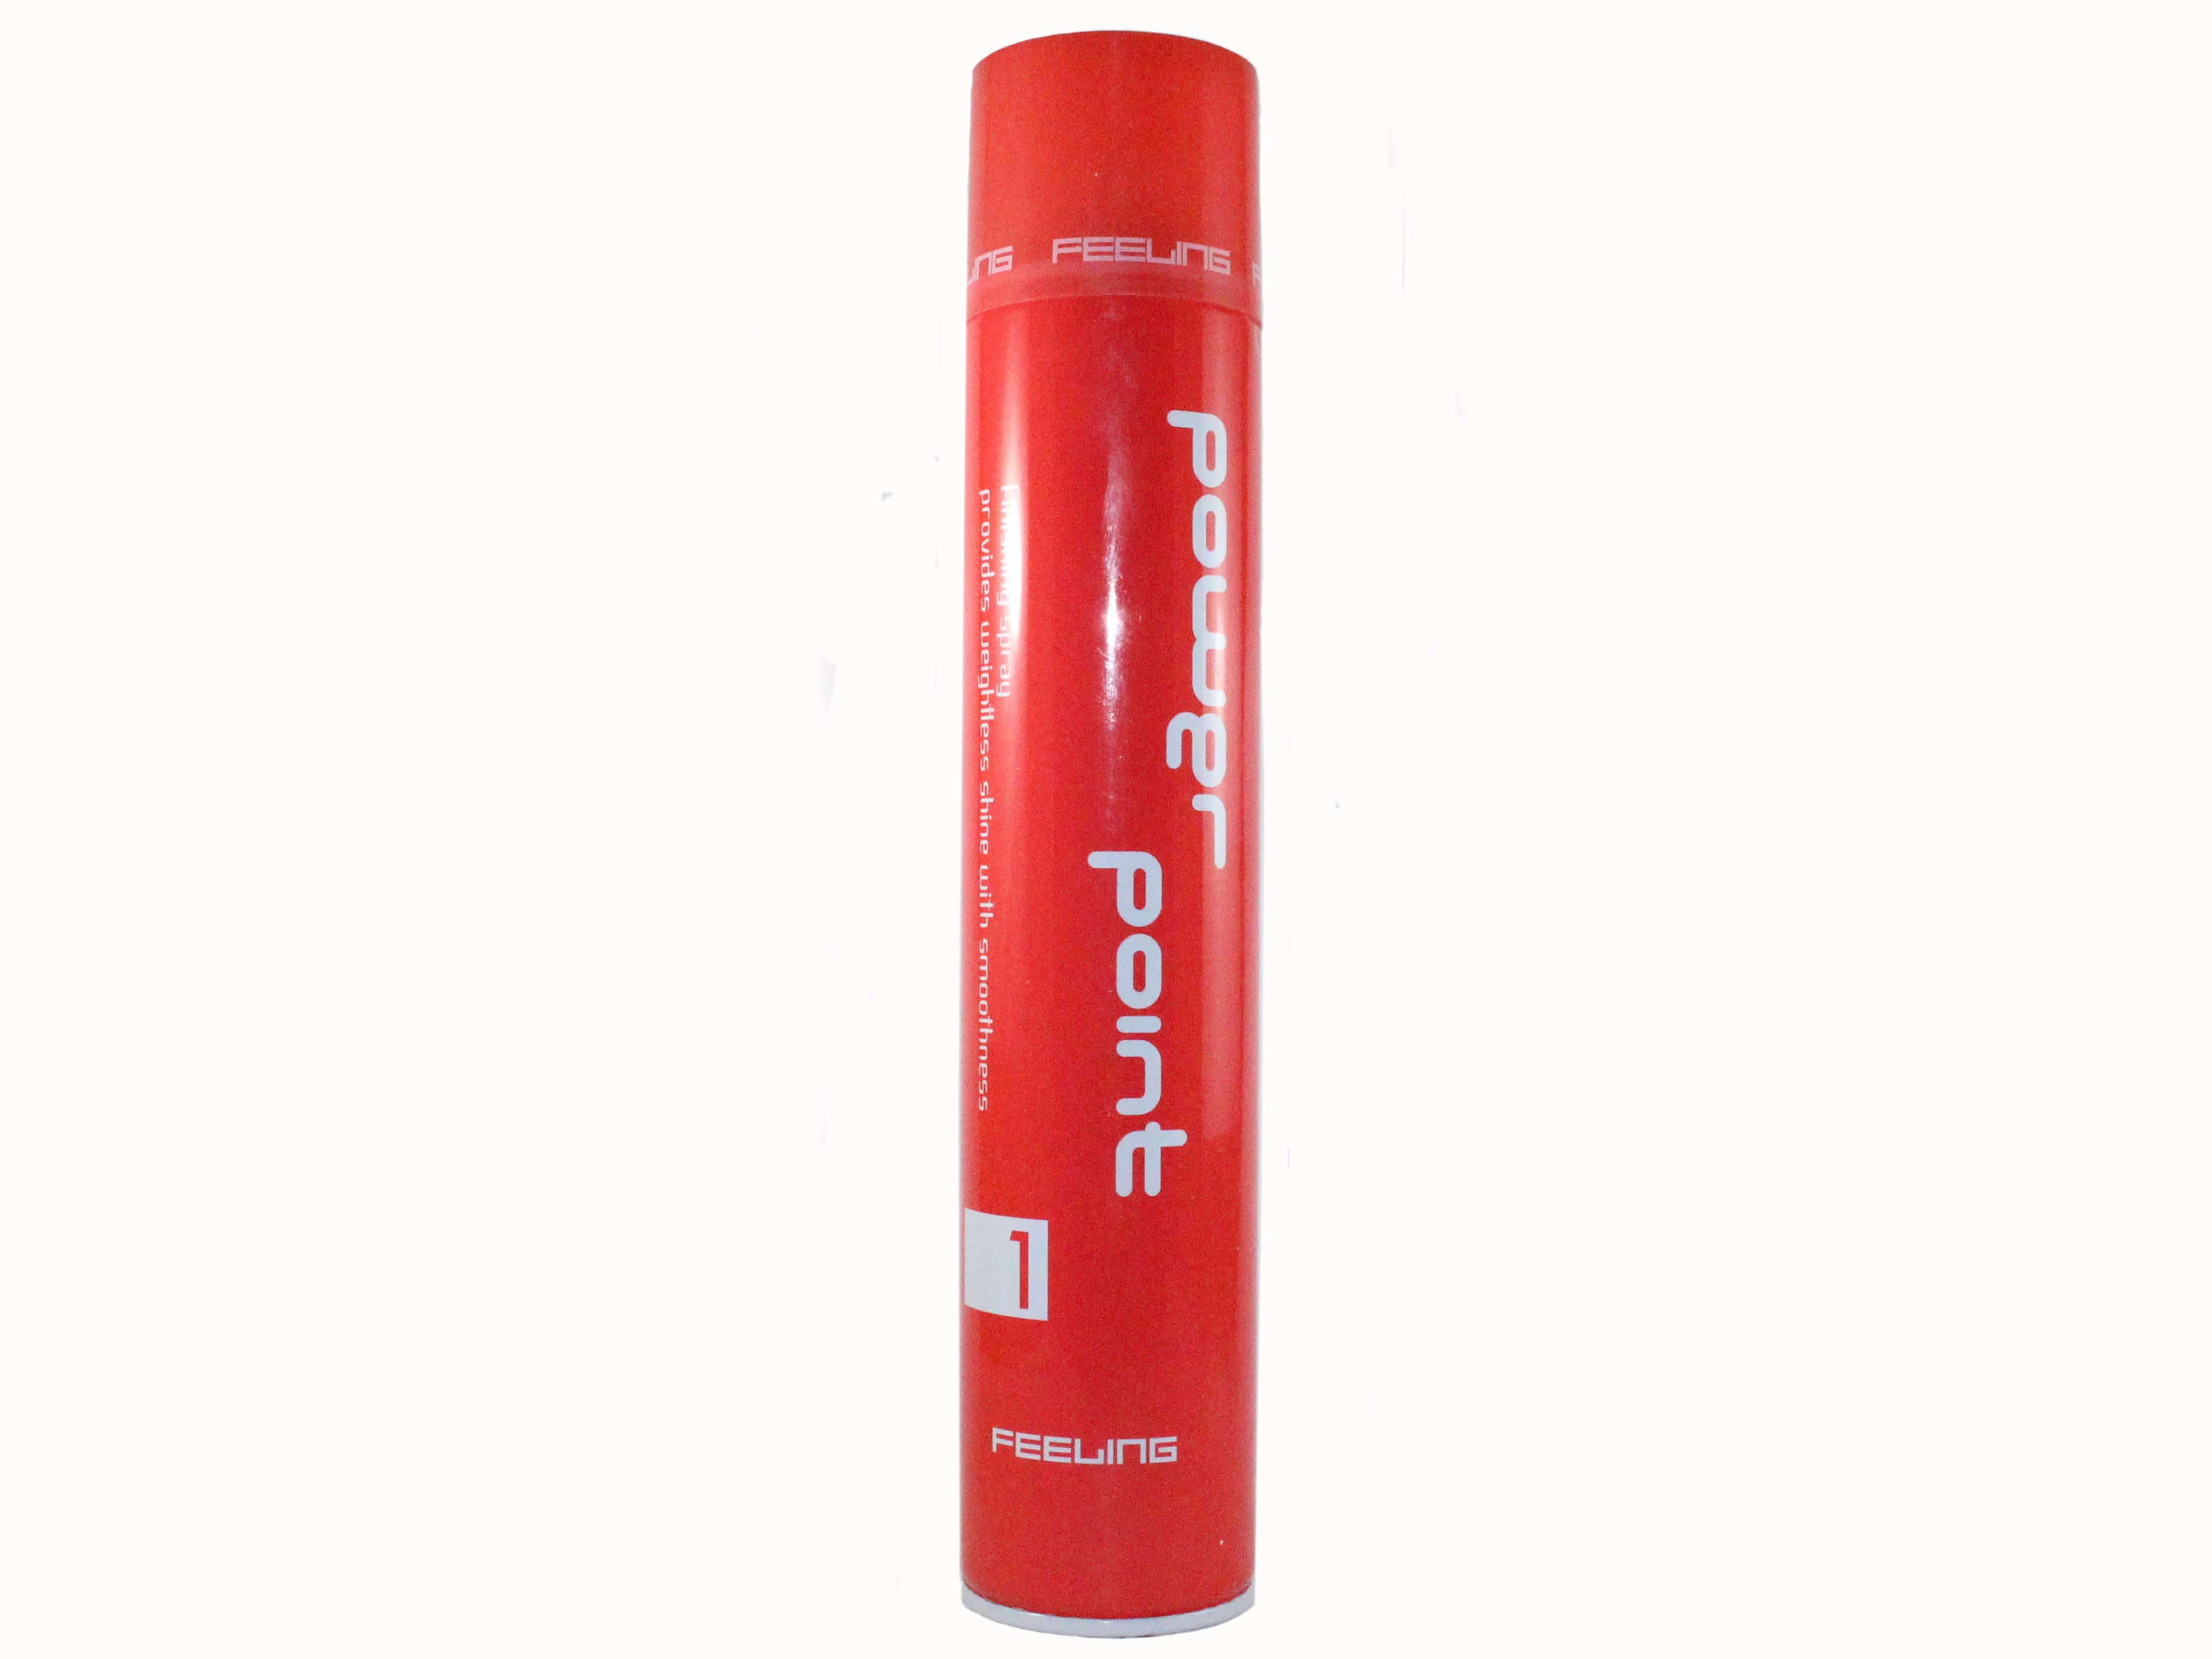 FEELING POWERPOINT FINISHING HAIR SPRAY 400ML